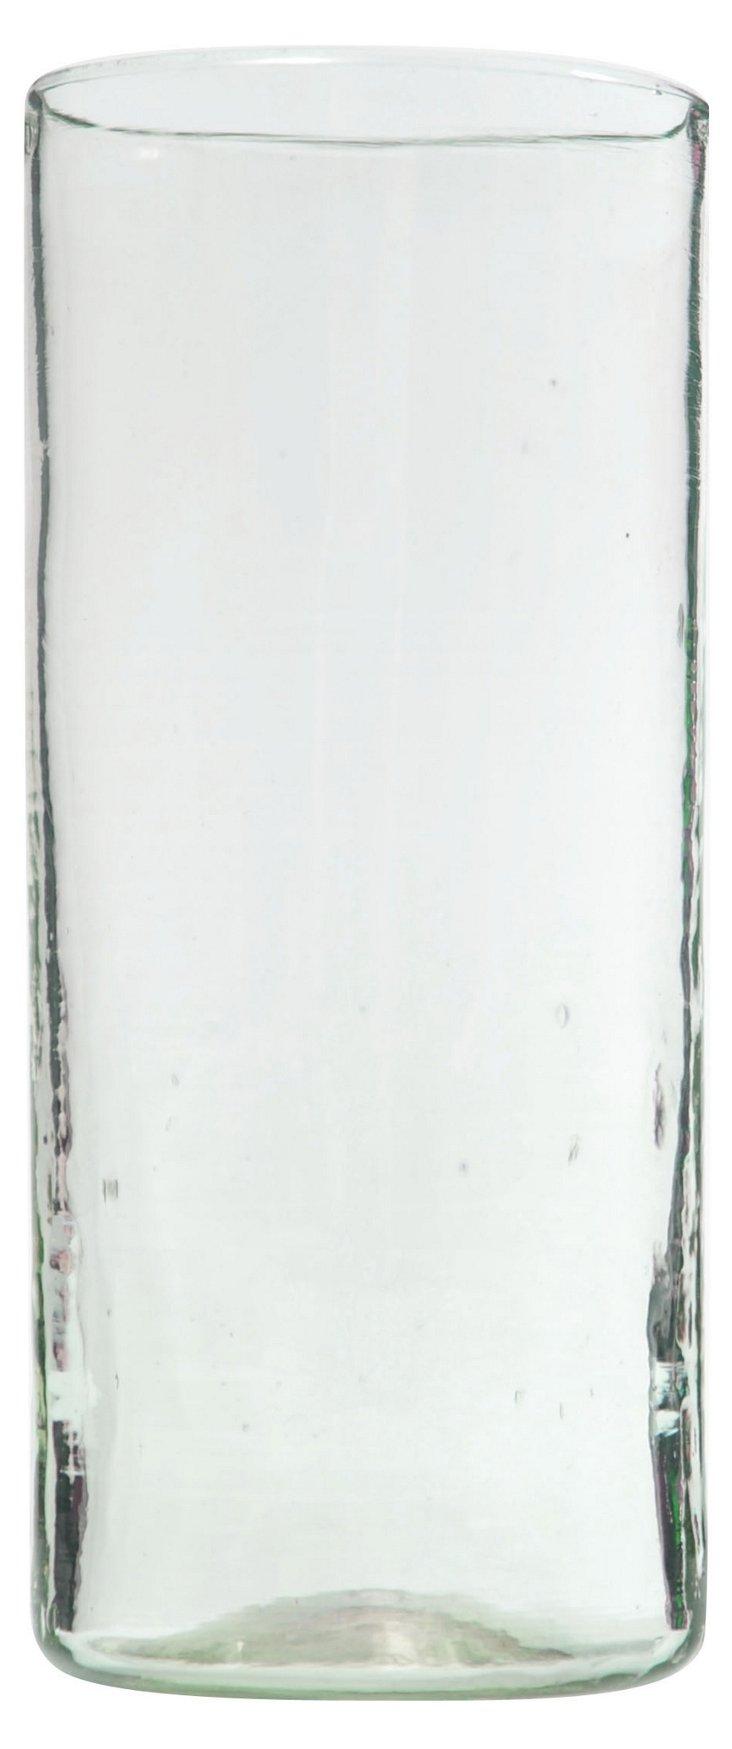 S/4 Khaled Juice Glasses